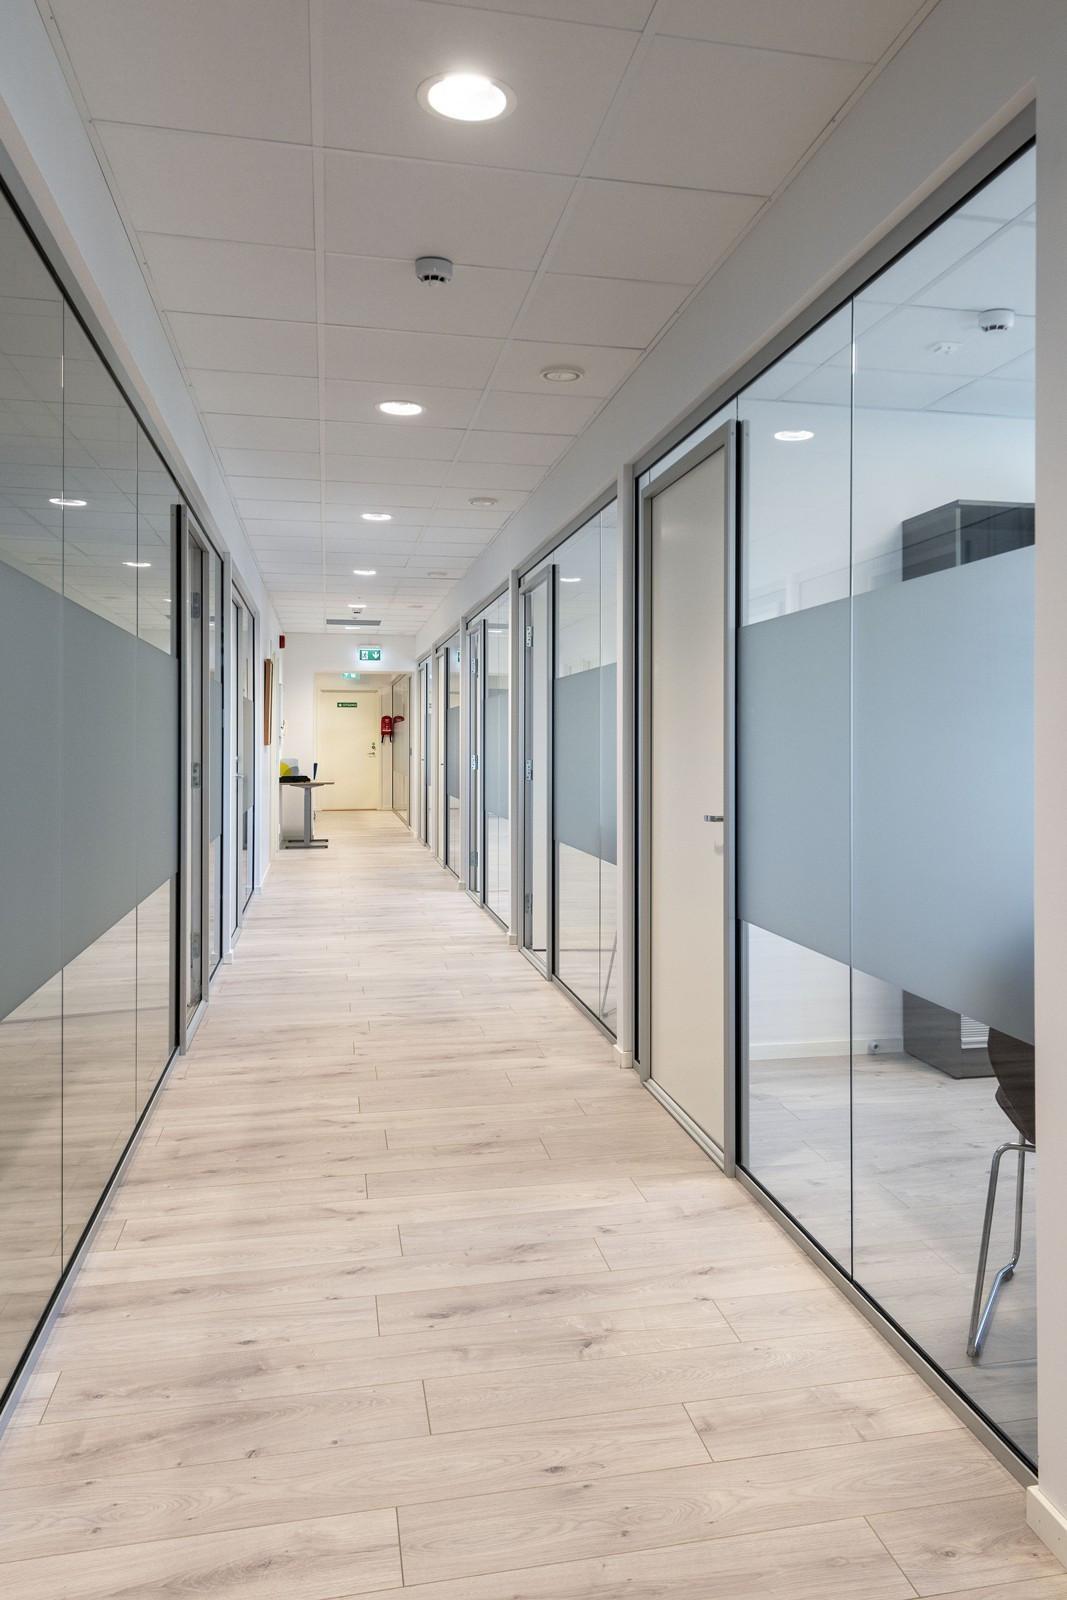 Lyse gangarealer med glass mellom cellekontor og fellesarealer